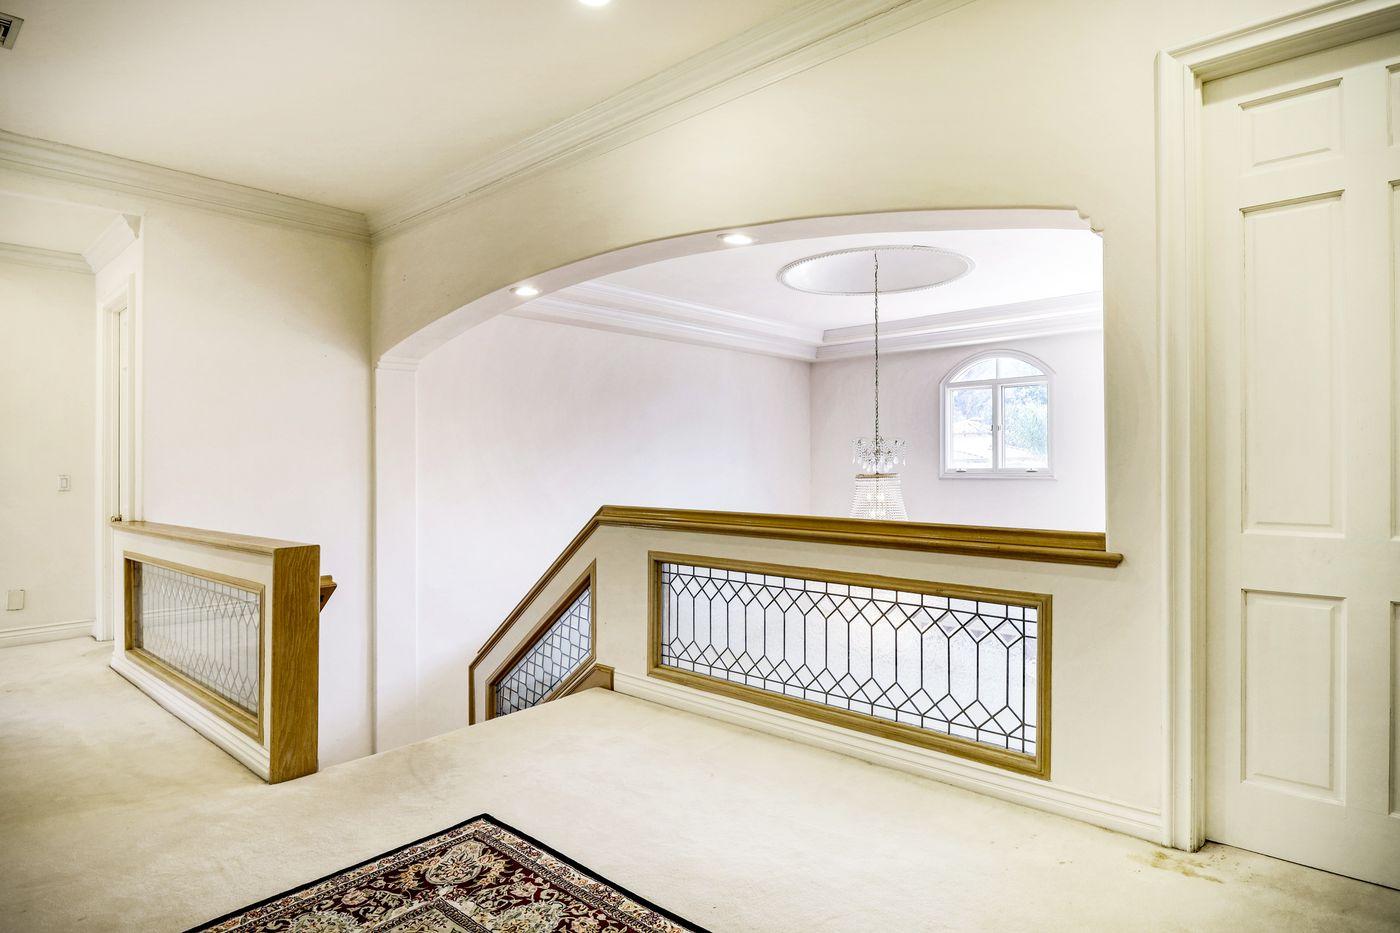 real-estate-photography-2245 Kingsbridge Ct-San Dimas-91773-airbnb-rental-interior-design-photographer-kasi-hyrapett-2-2